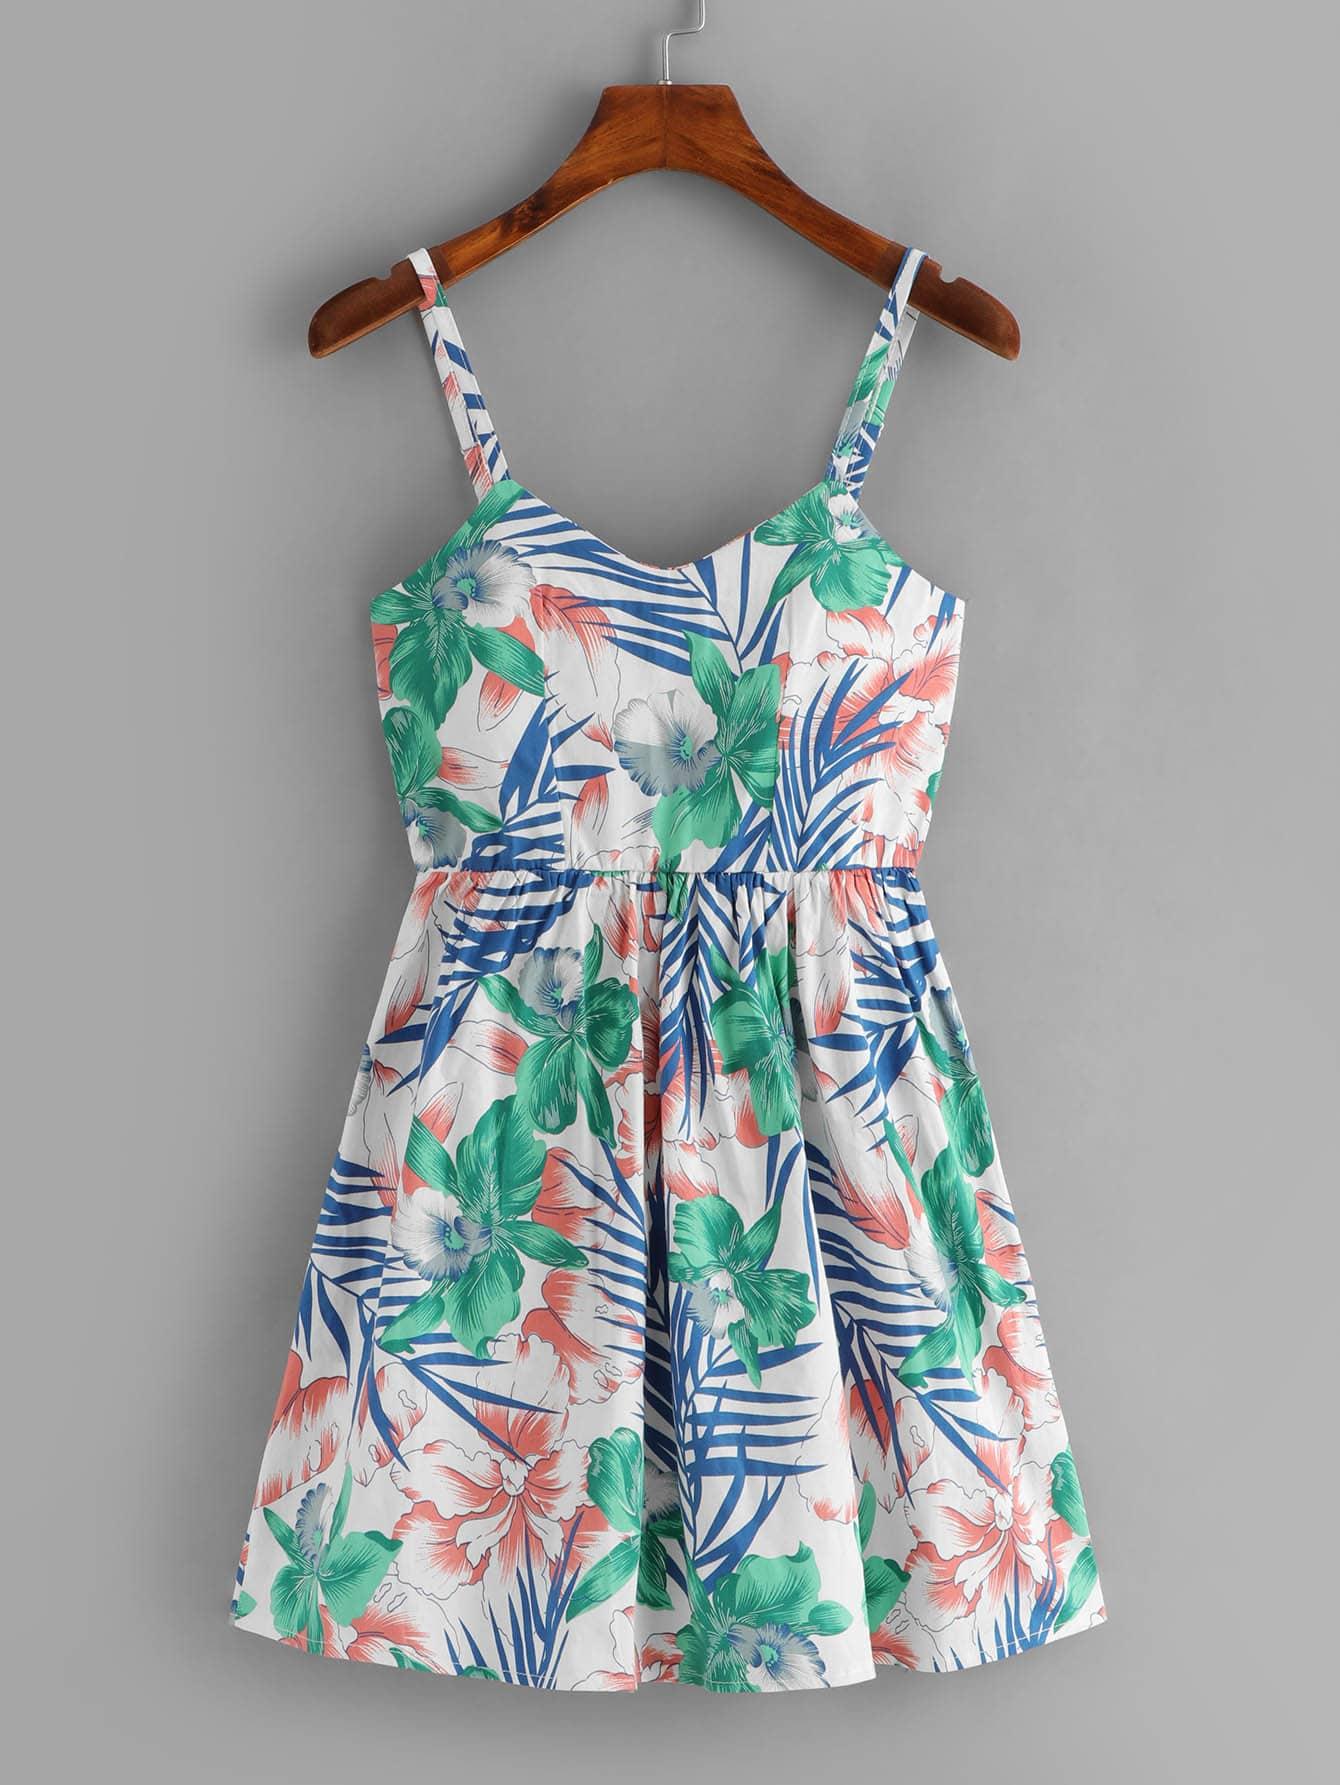 Floral Print Lace Up Back Cami Dress